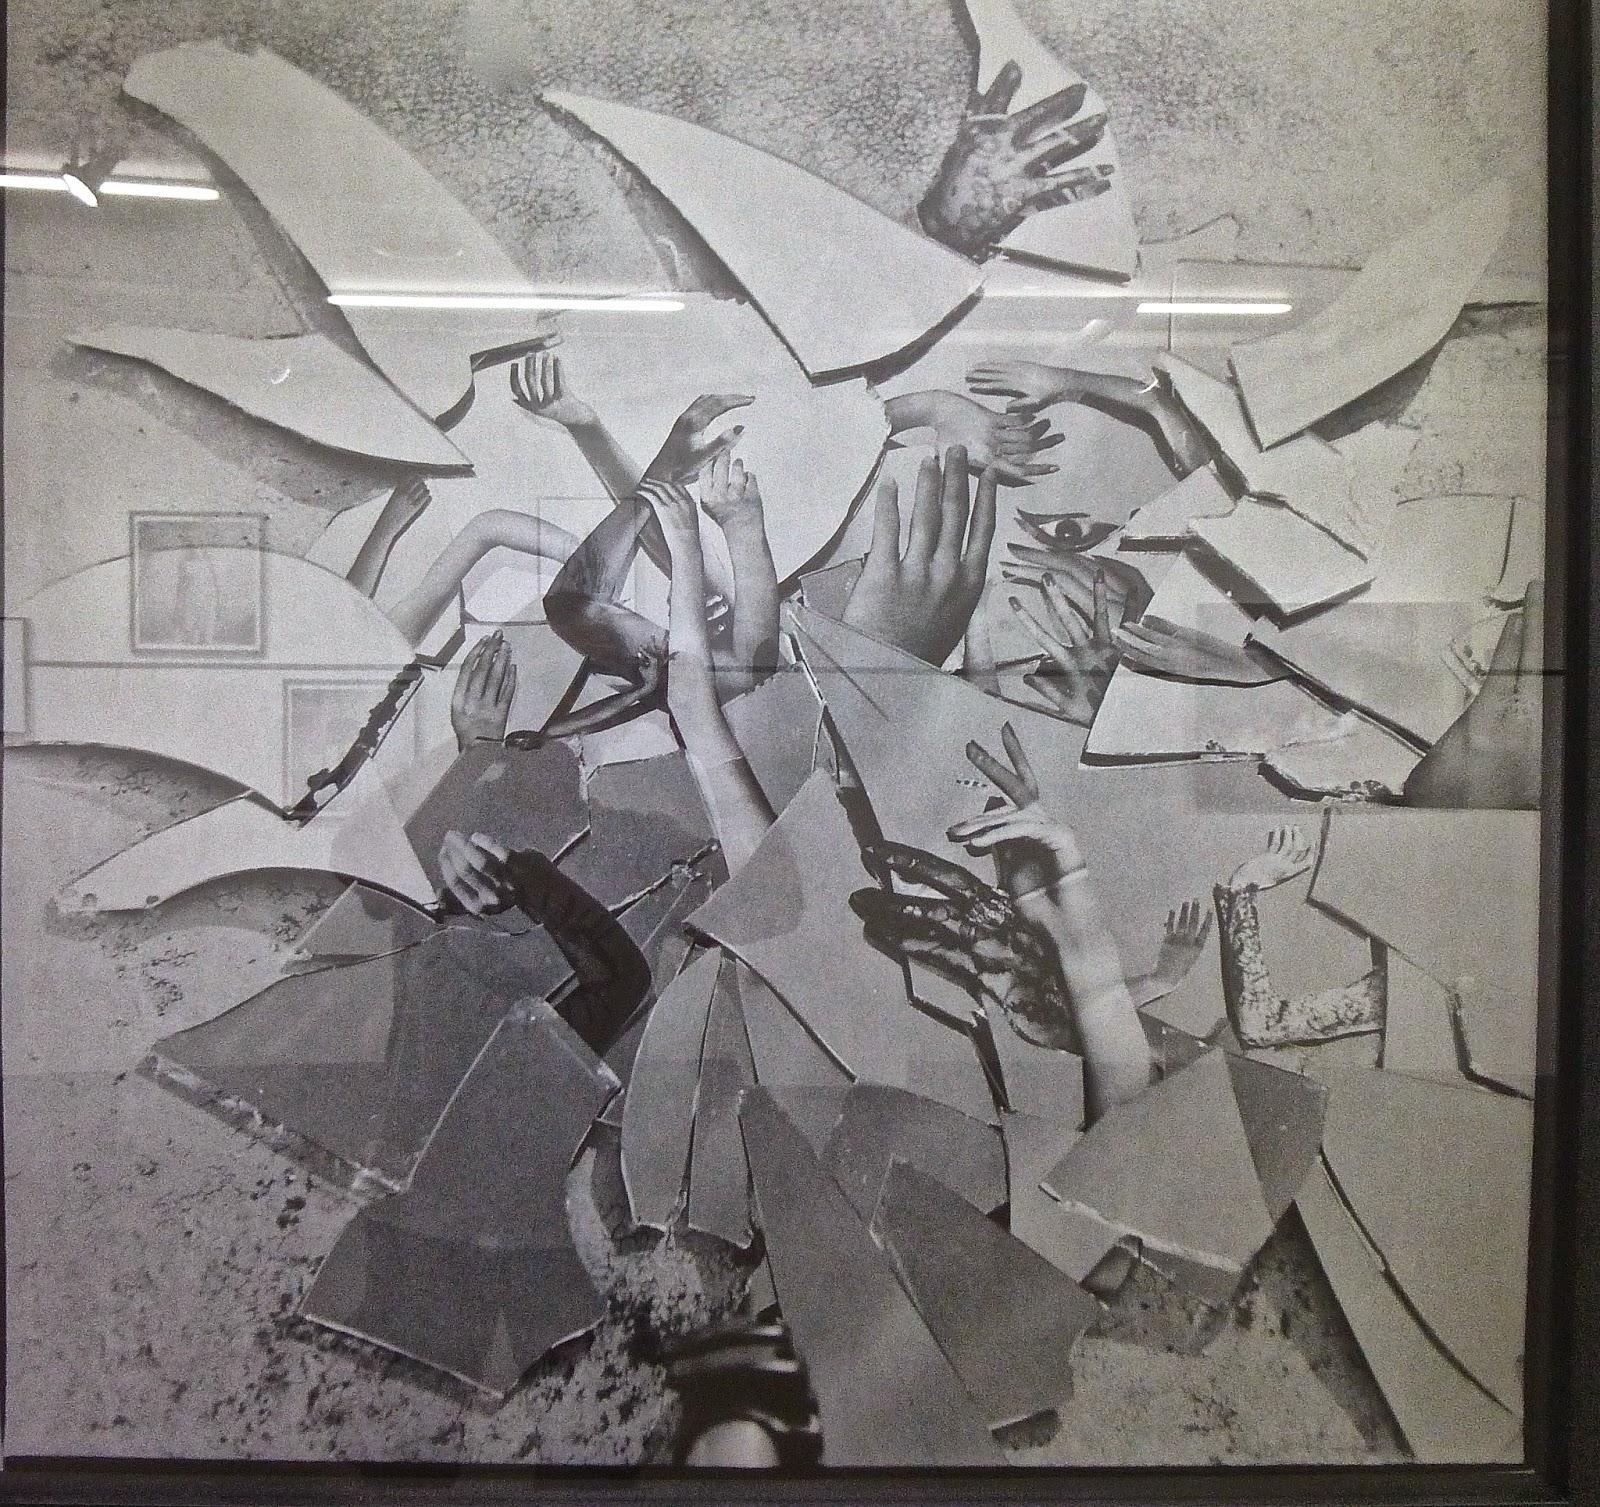 What Are Contemporary: DriveByCuriosity: Contemporary Art: Unconscious Lens